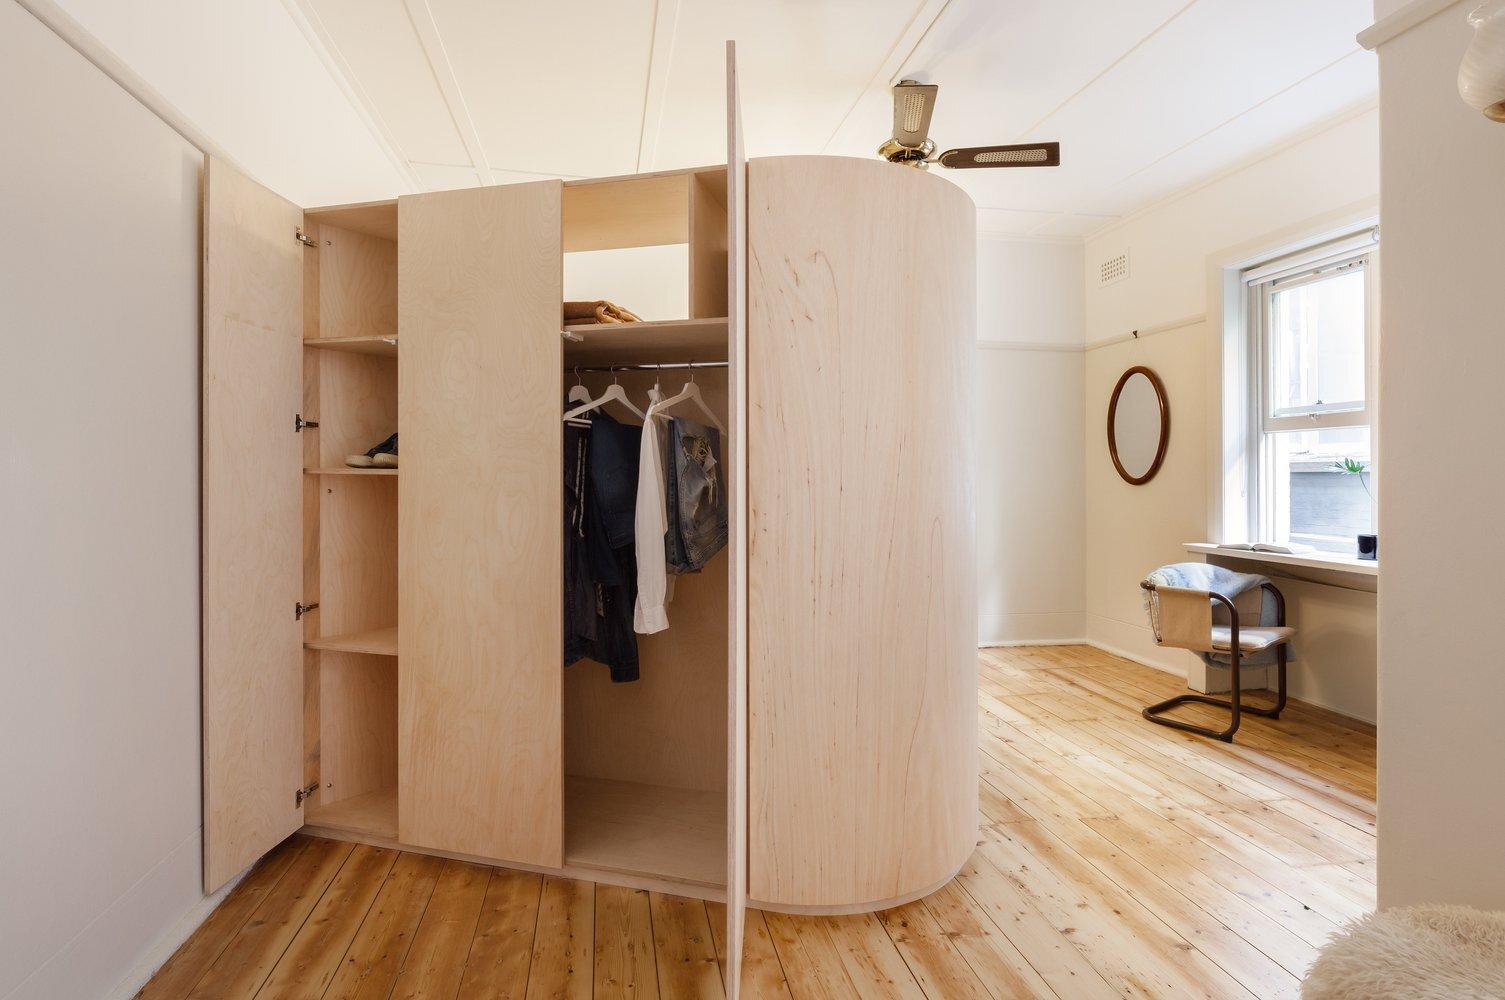 Small and Sculpted Studio Apartment - Catseye Bay Design - Darlinghurst Australia - Storage - Humble Homes